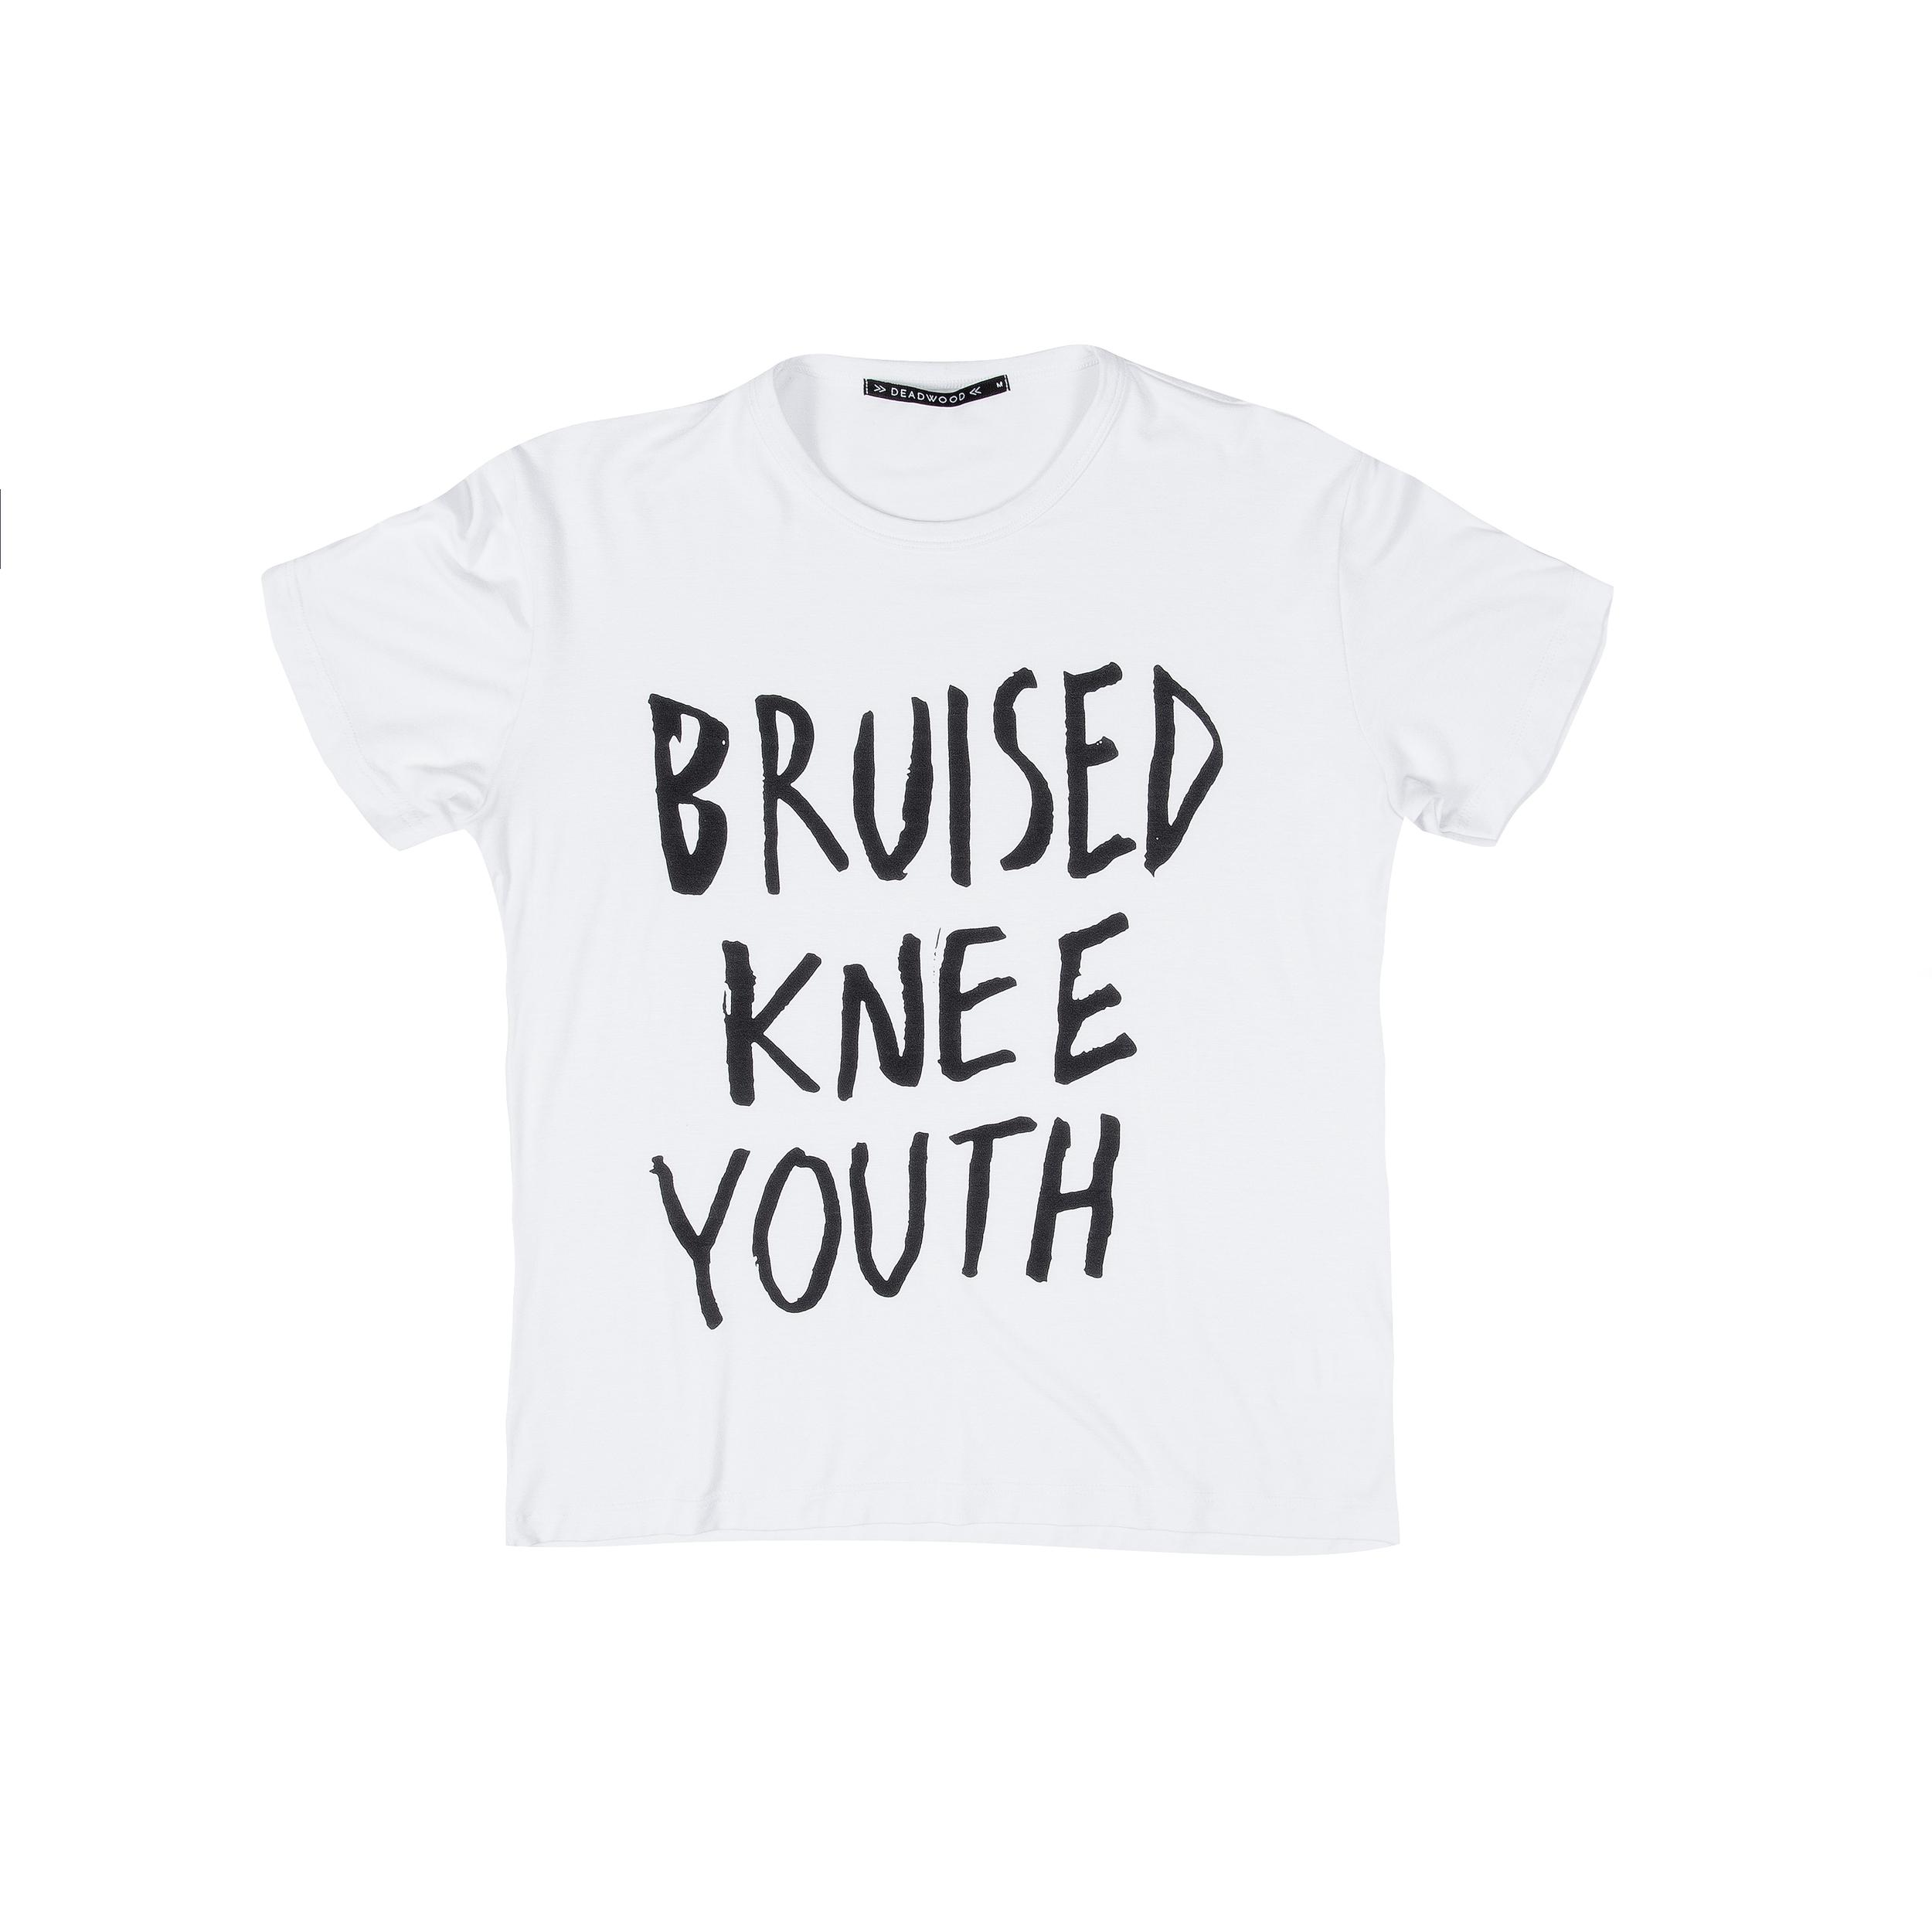 Bruised Knee Youth T-shirt